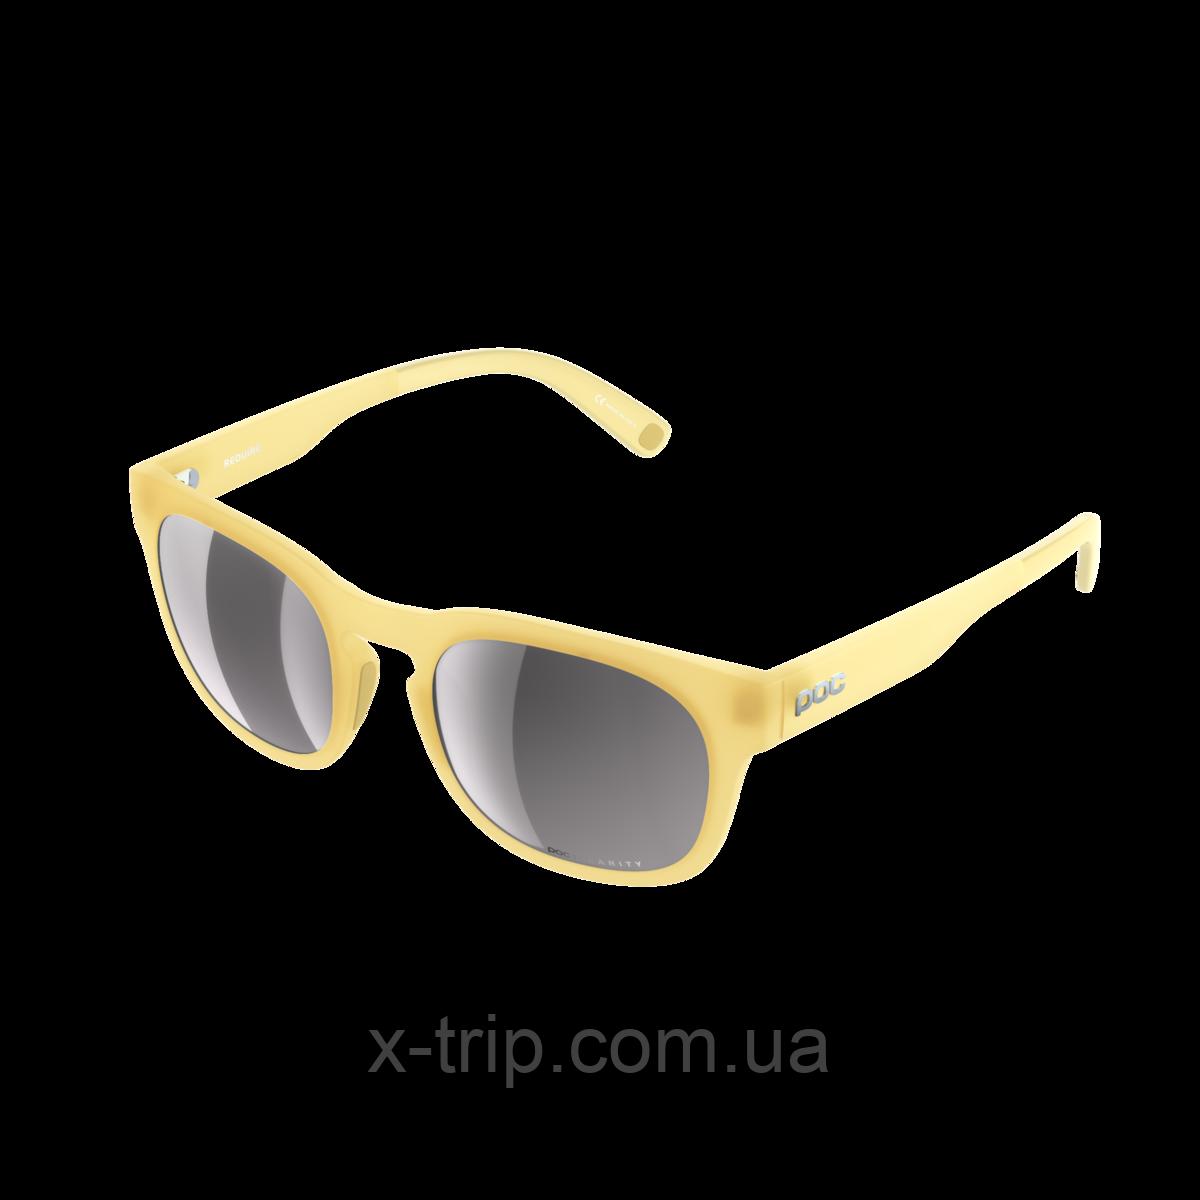 Сонцезахисні окуляри POC Require, Sulfur Yellow/Violet/Mirror Silver (PC RE10101321VSI1)